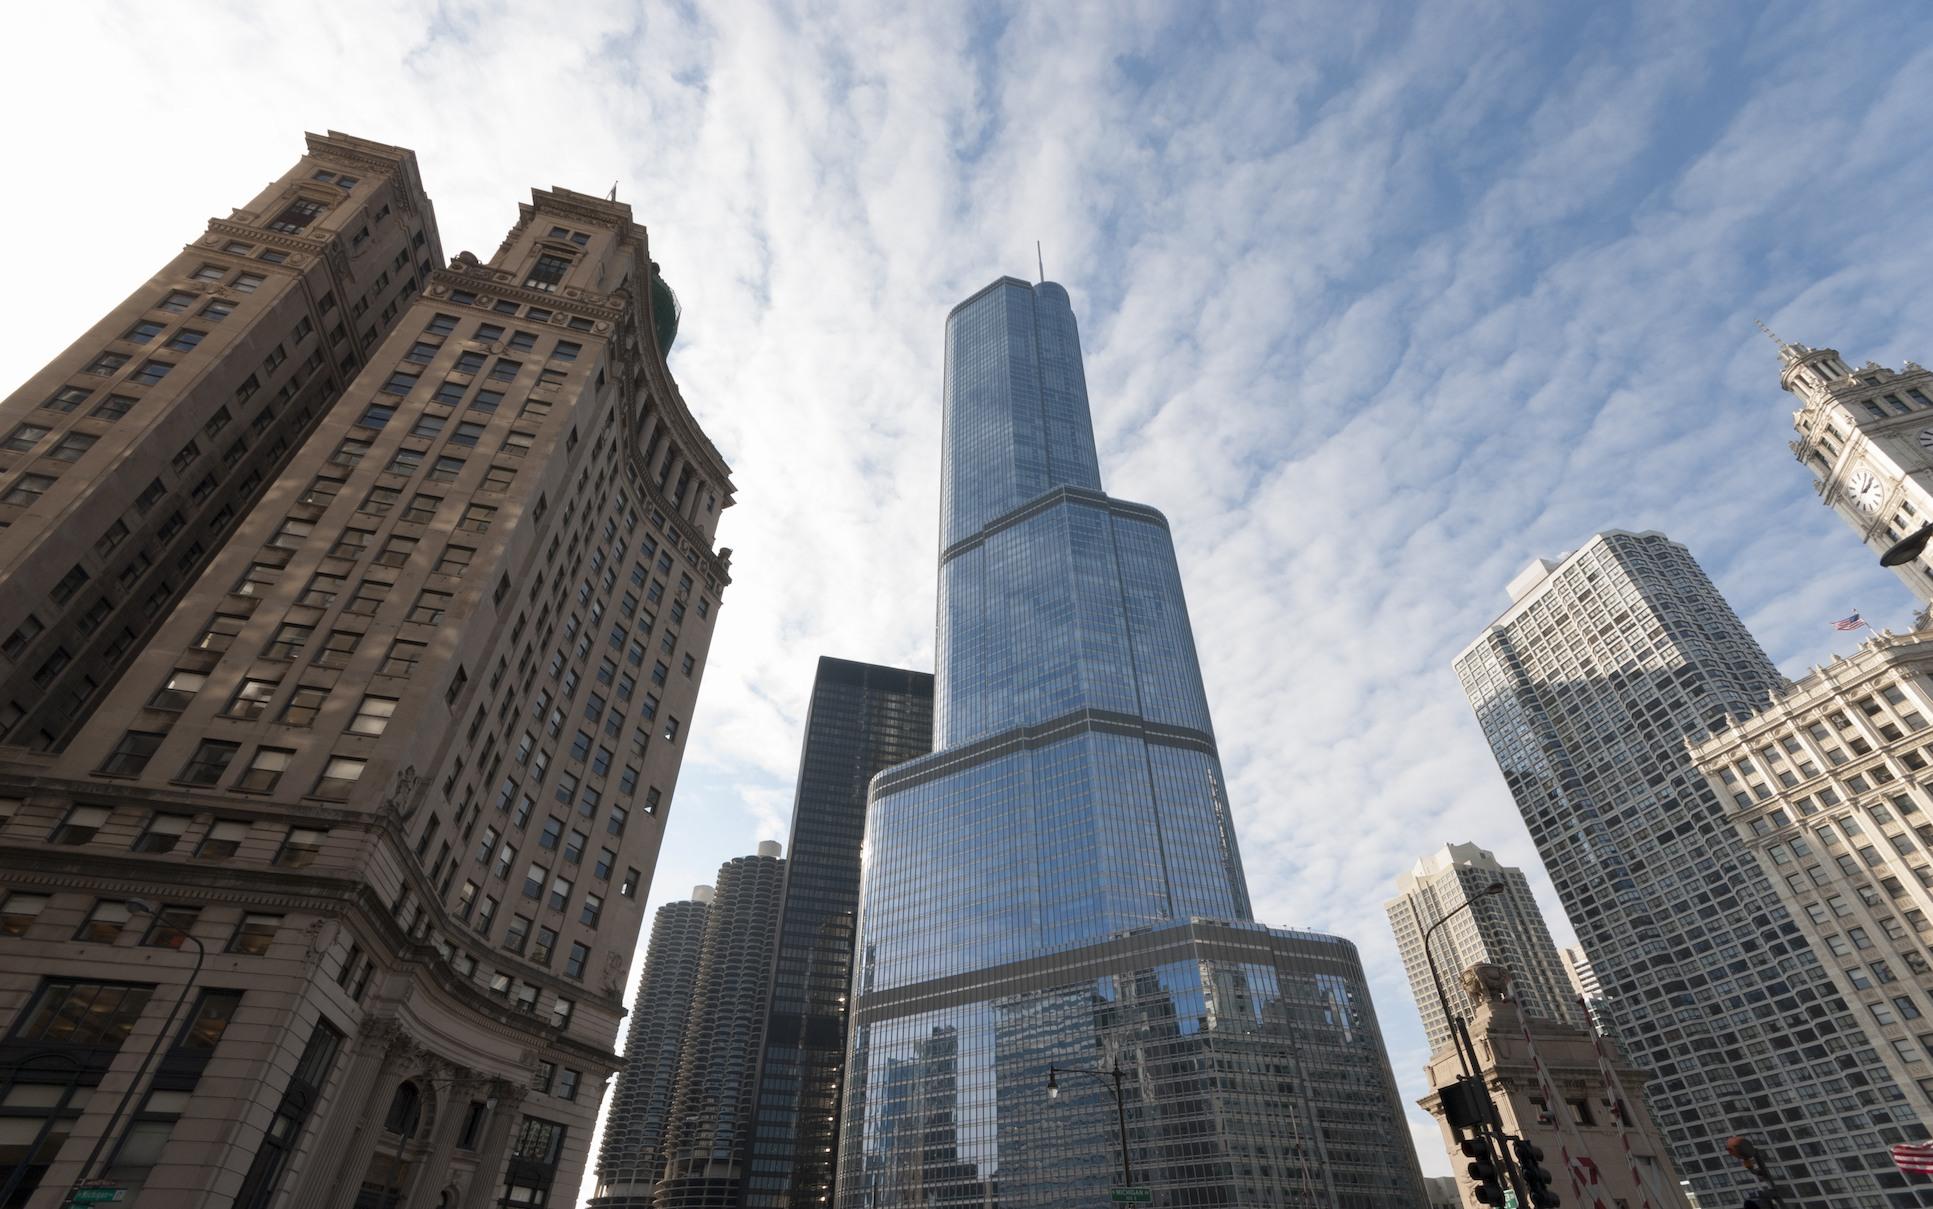 International Tower skyscraper in Chicago